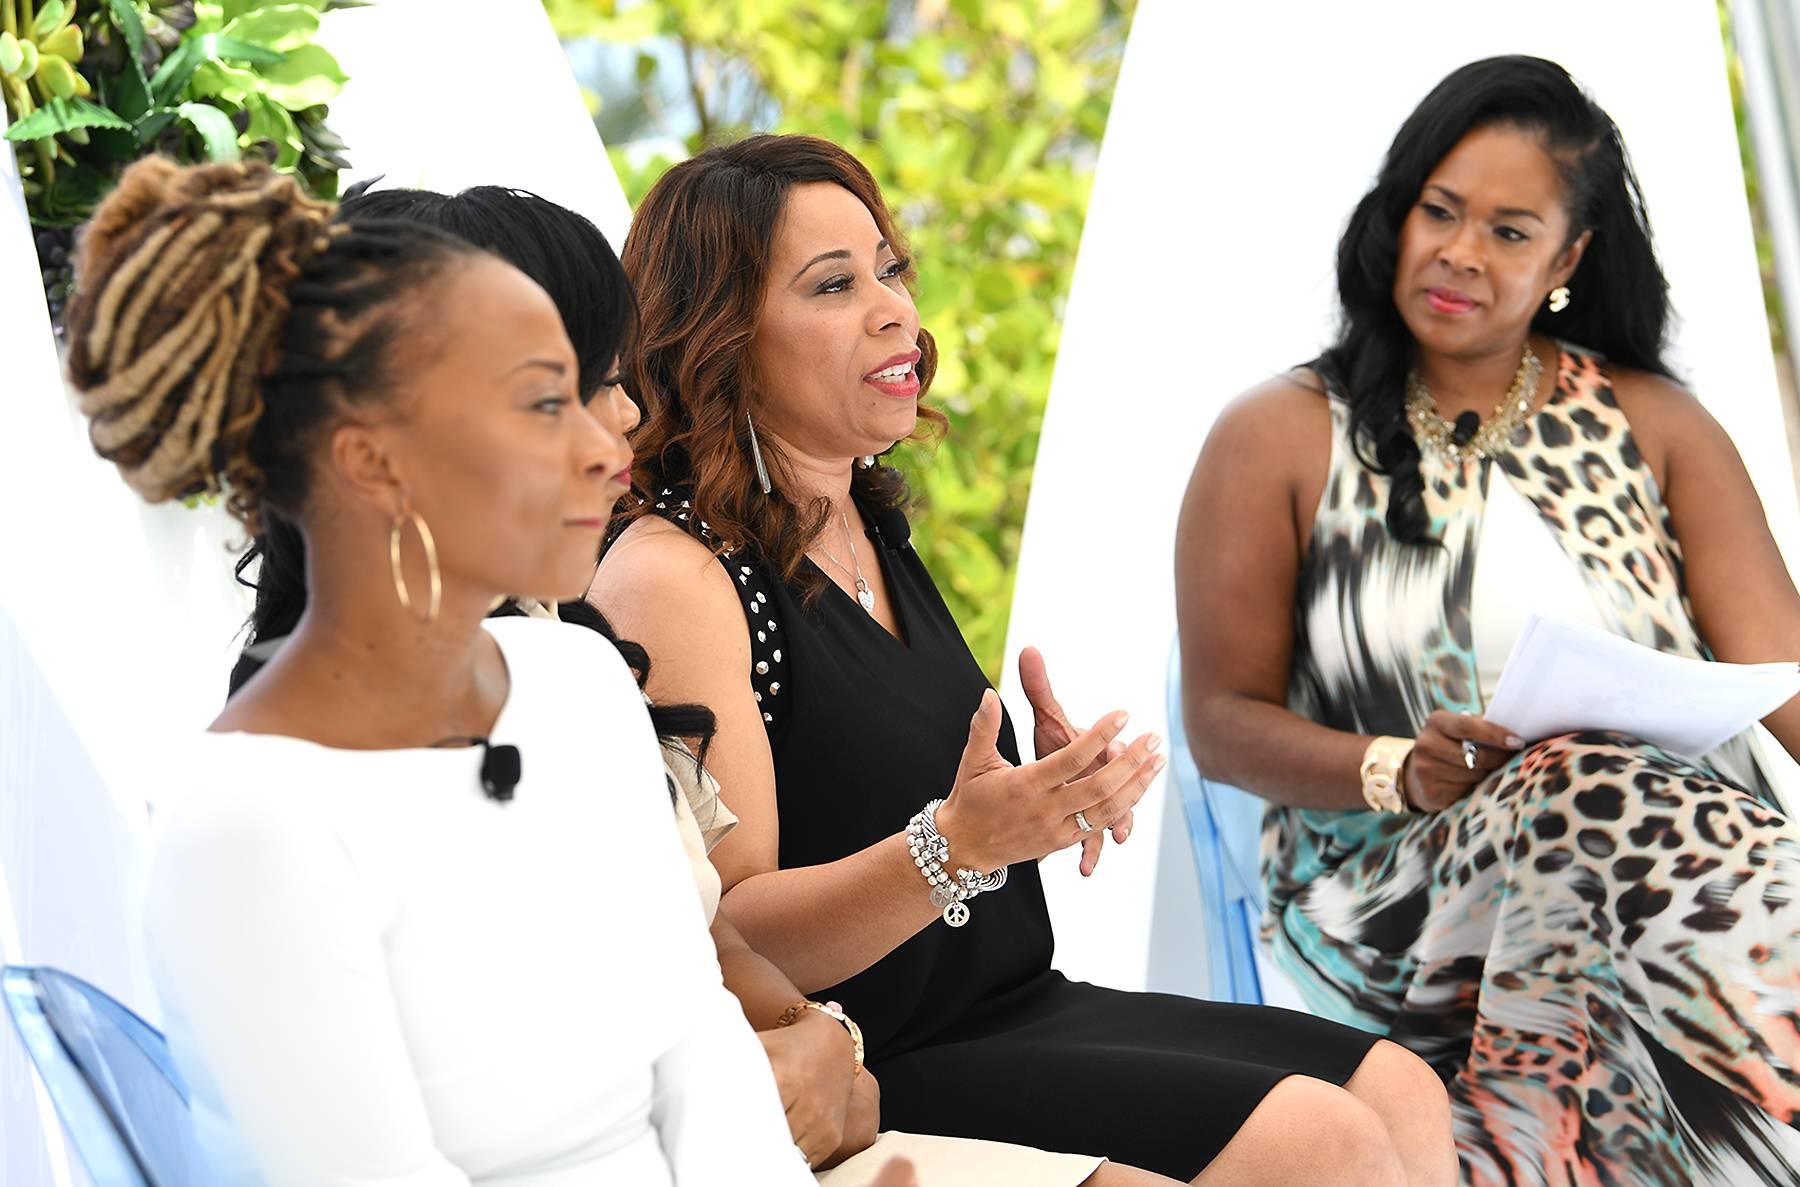 Teneshia Jackson Warner,Felicia Phillips,Sonia Jackson Myles - Teneshia Jackson Warner,Felicia Phillips,Sonia Jackson Myles (Photo: Phelan Marc/BET)